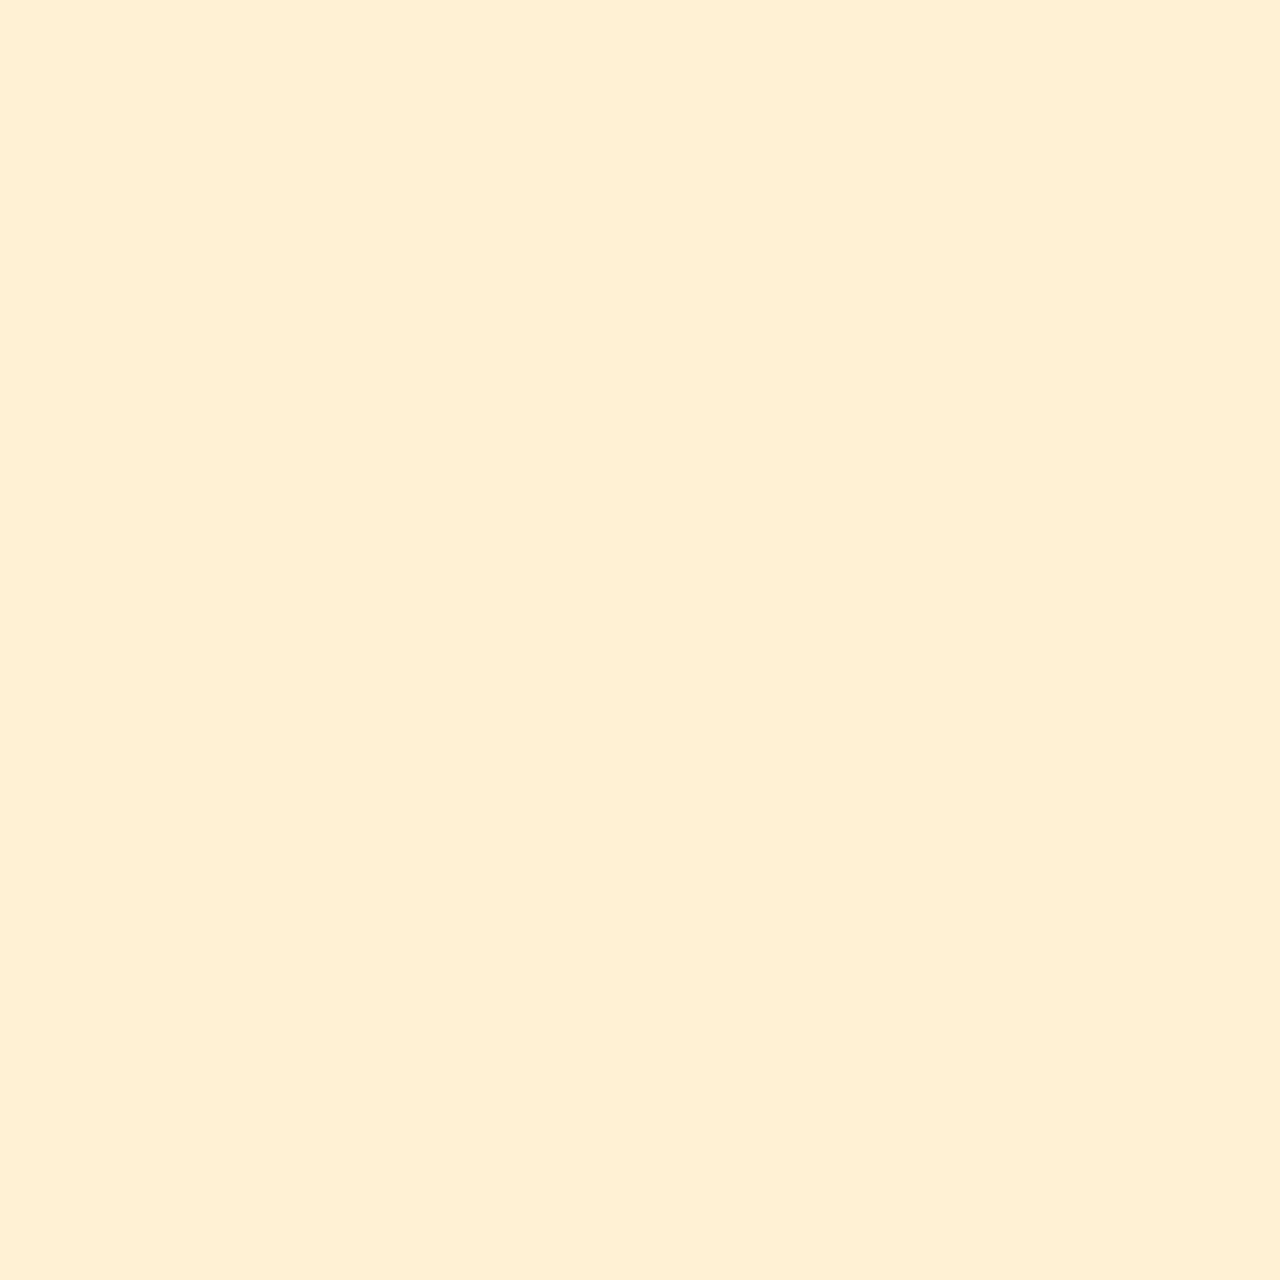 "SUPERIOR SEAMLESS PAPER BACKGROUND 53""X36' - CREME"